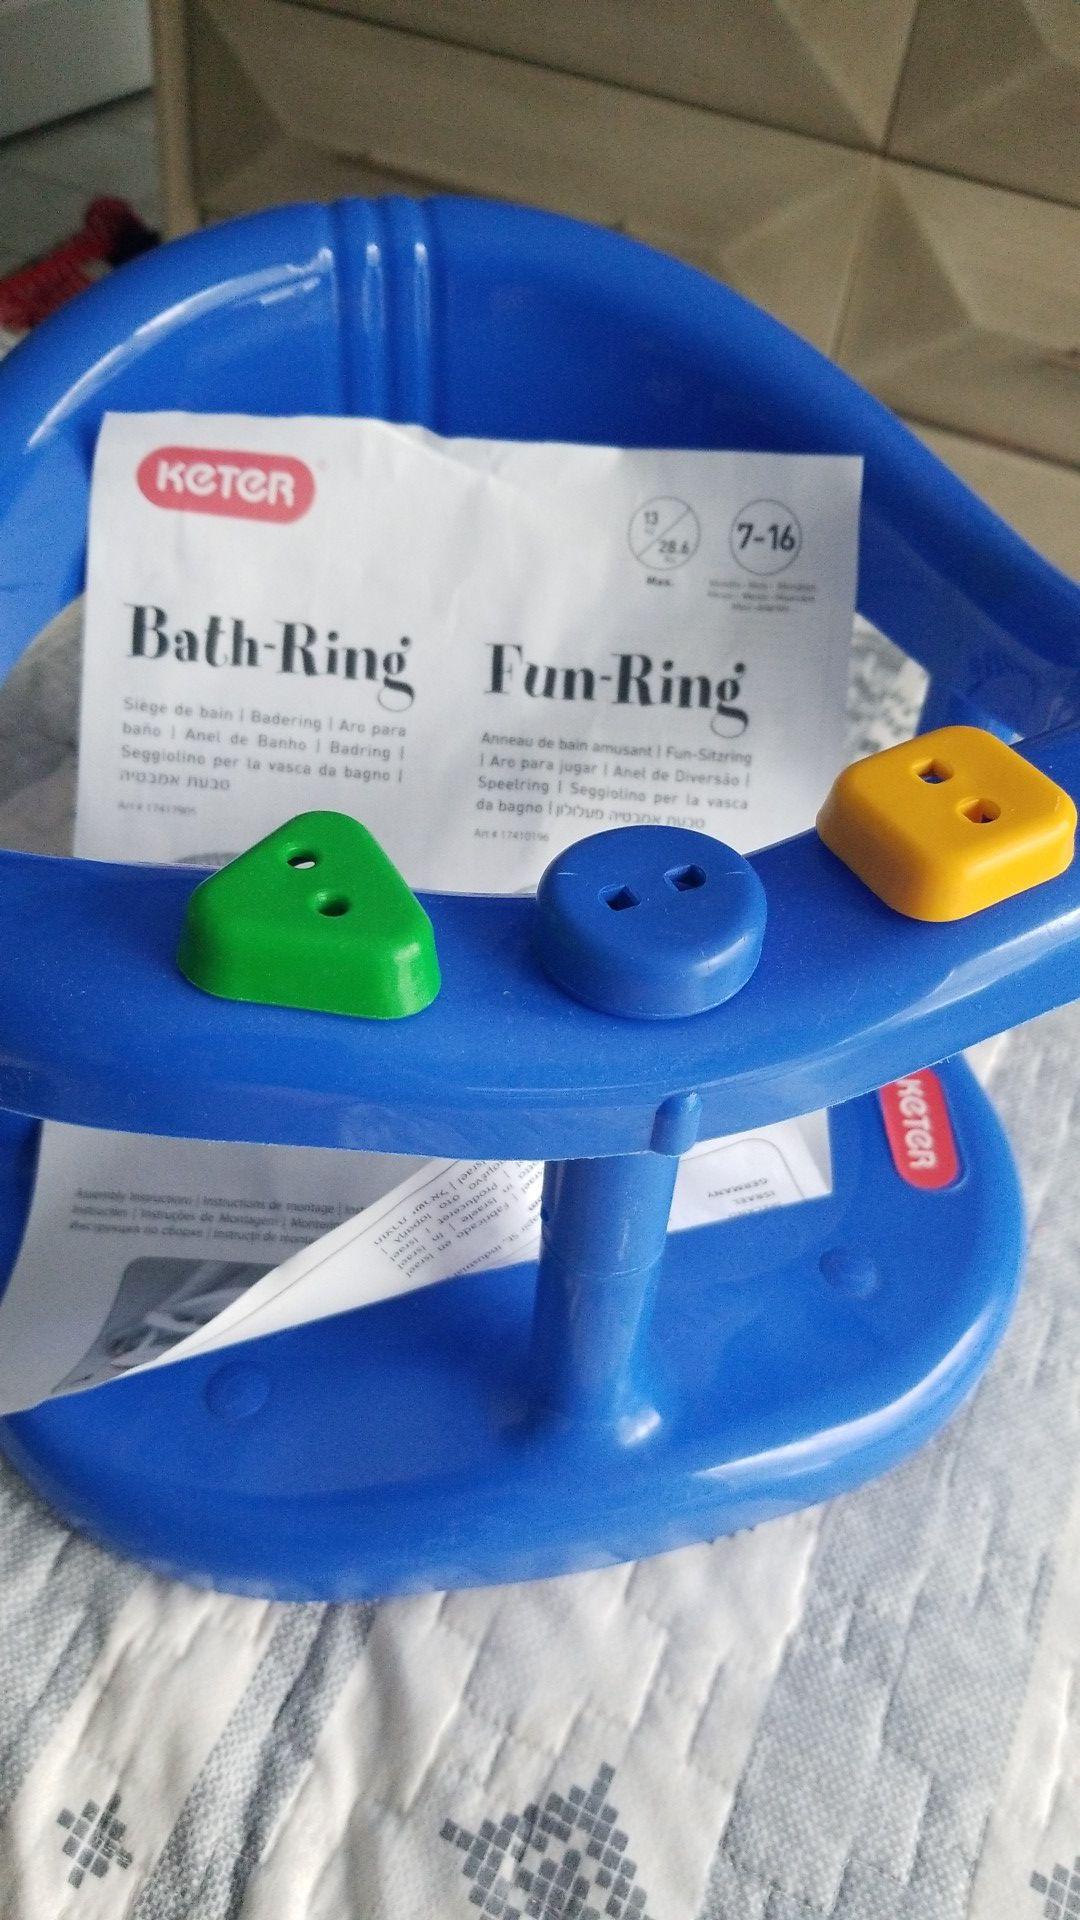 Keter bath ring